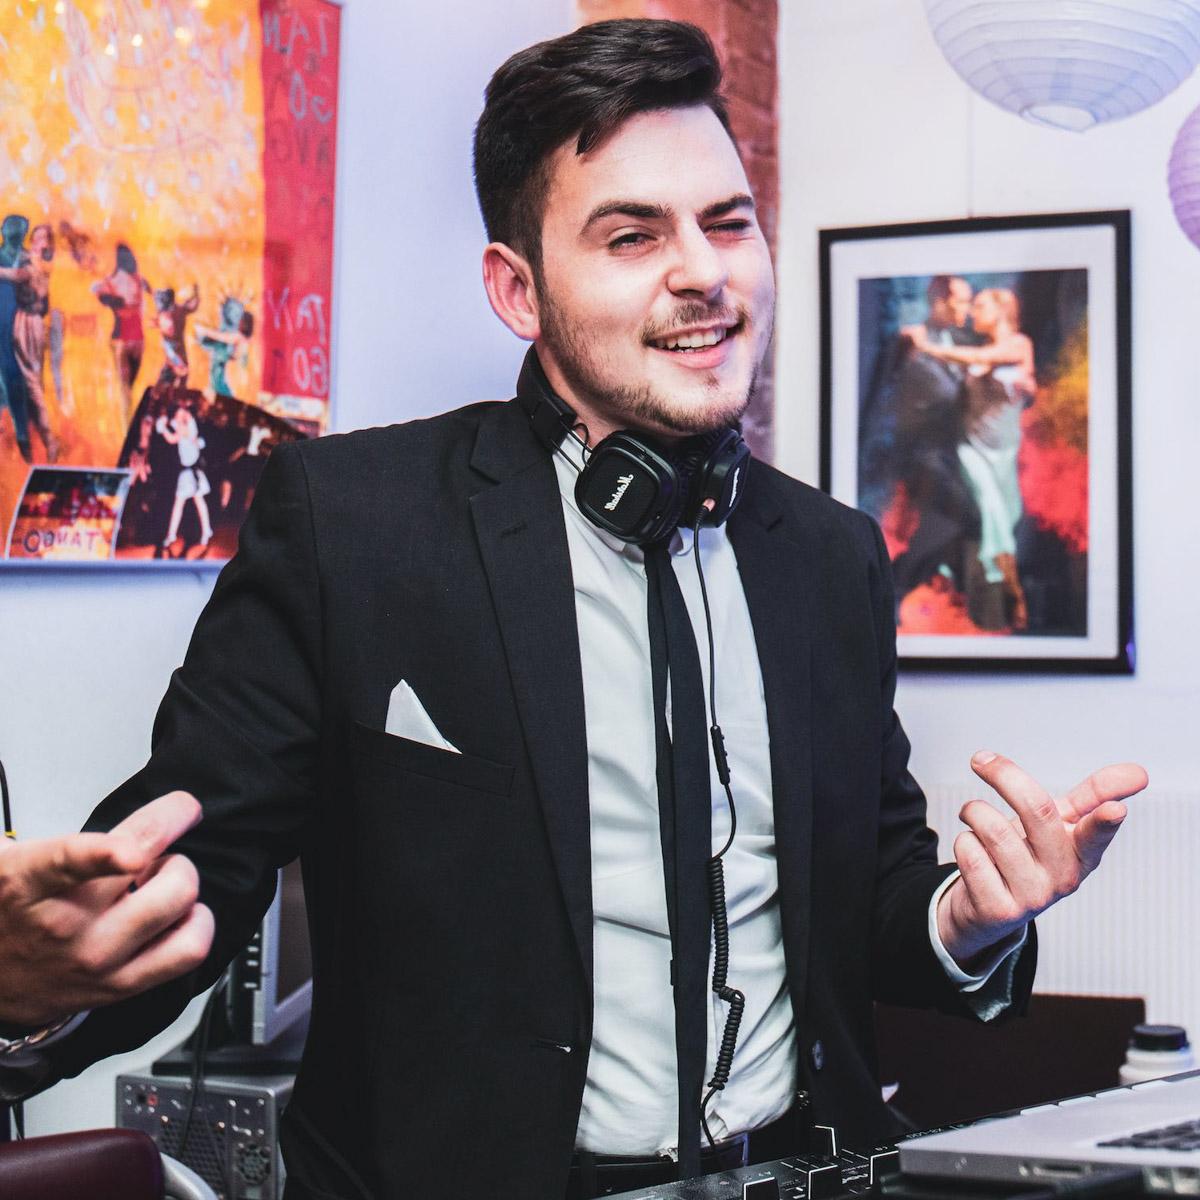 DJ |Hannover |Hochzeit |DJ |Marvin |Feike |DJ |Firmenfeier |DJ |Geburtstag |DJ |Messeparty |DJ |Betriebsfeier |DJ |Sommerfest |DJ |Gala |Buchen |Mieten |Anfragen |Lehmann |Eventservice